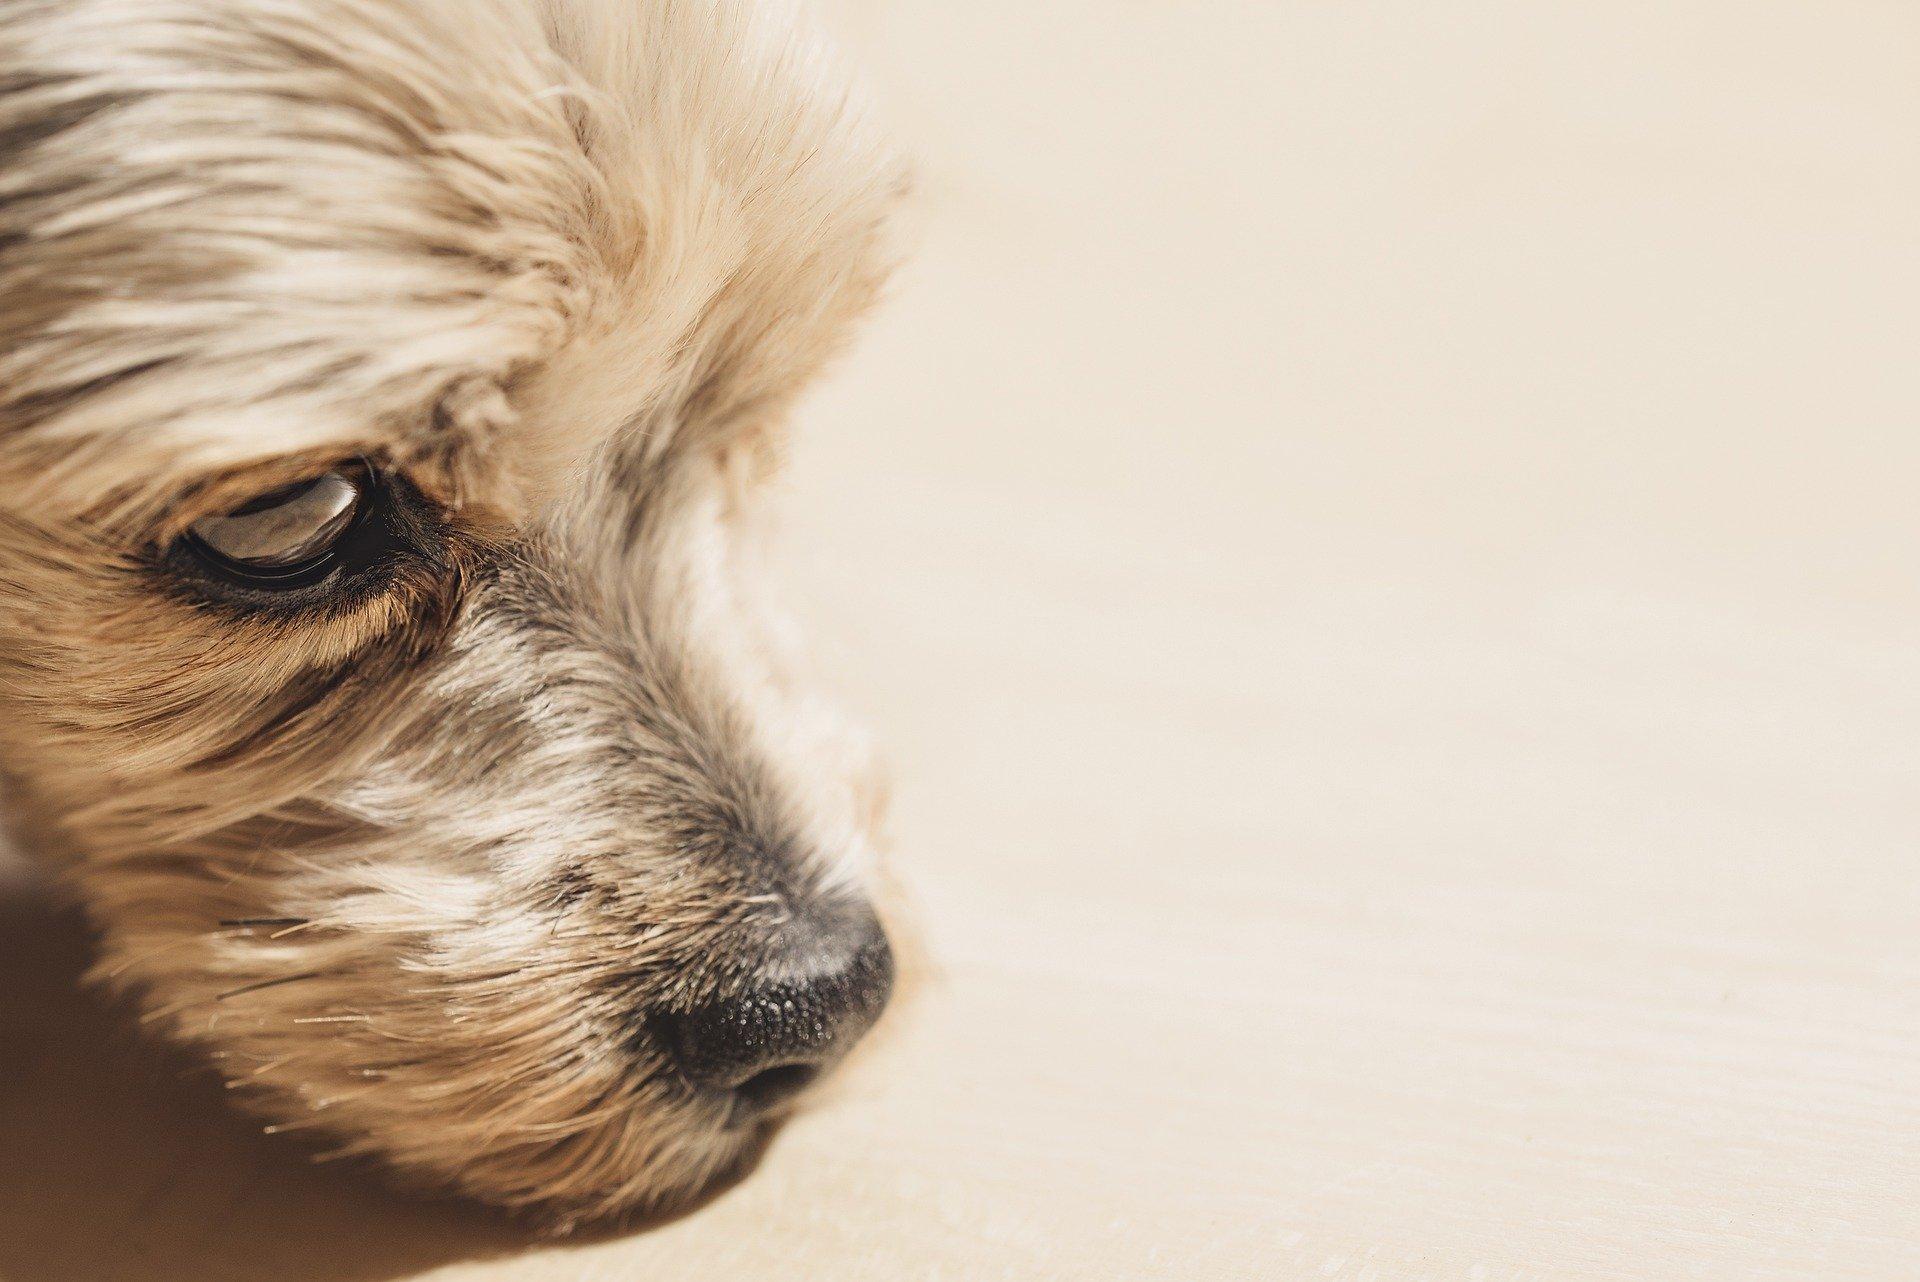 yorkshire-terrier-6202621_1920